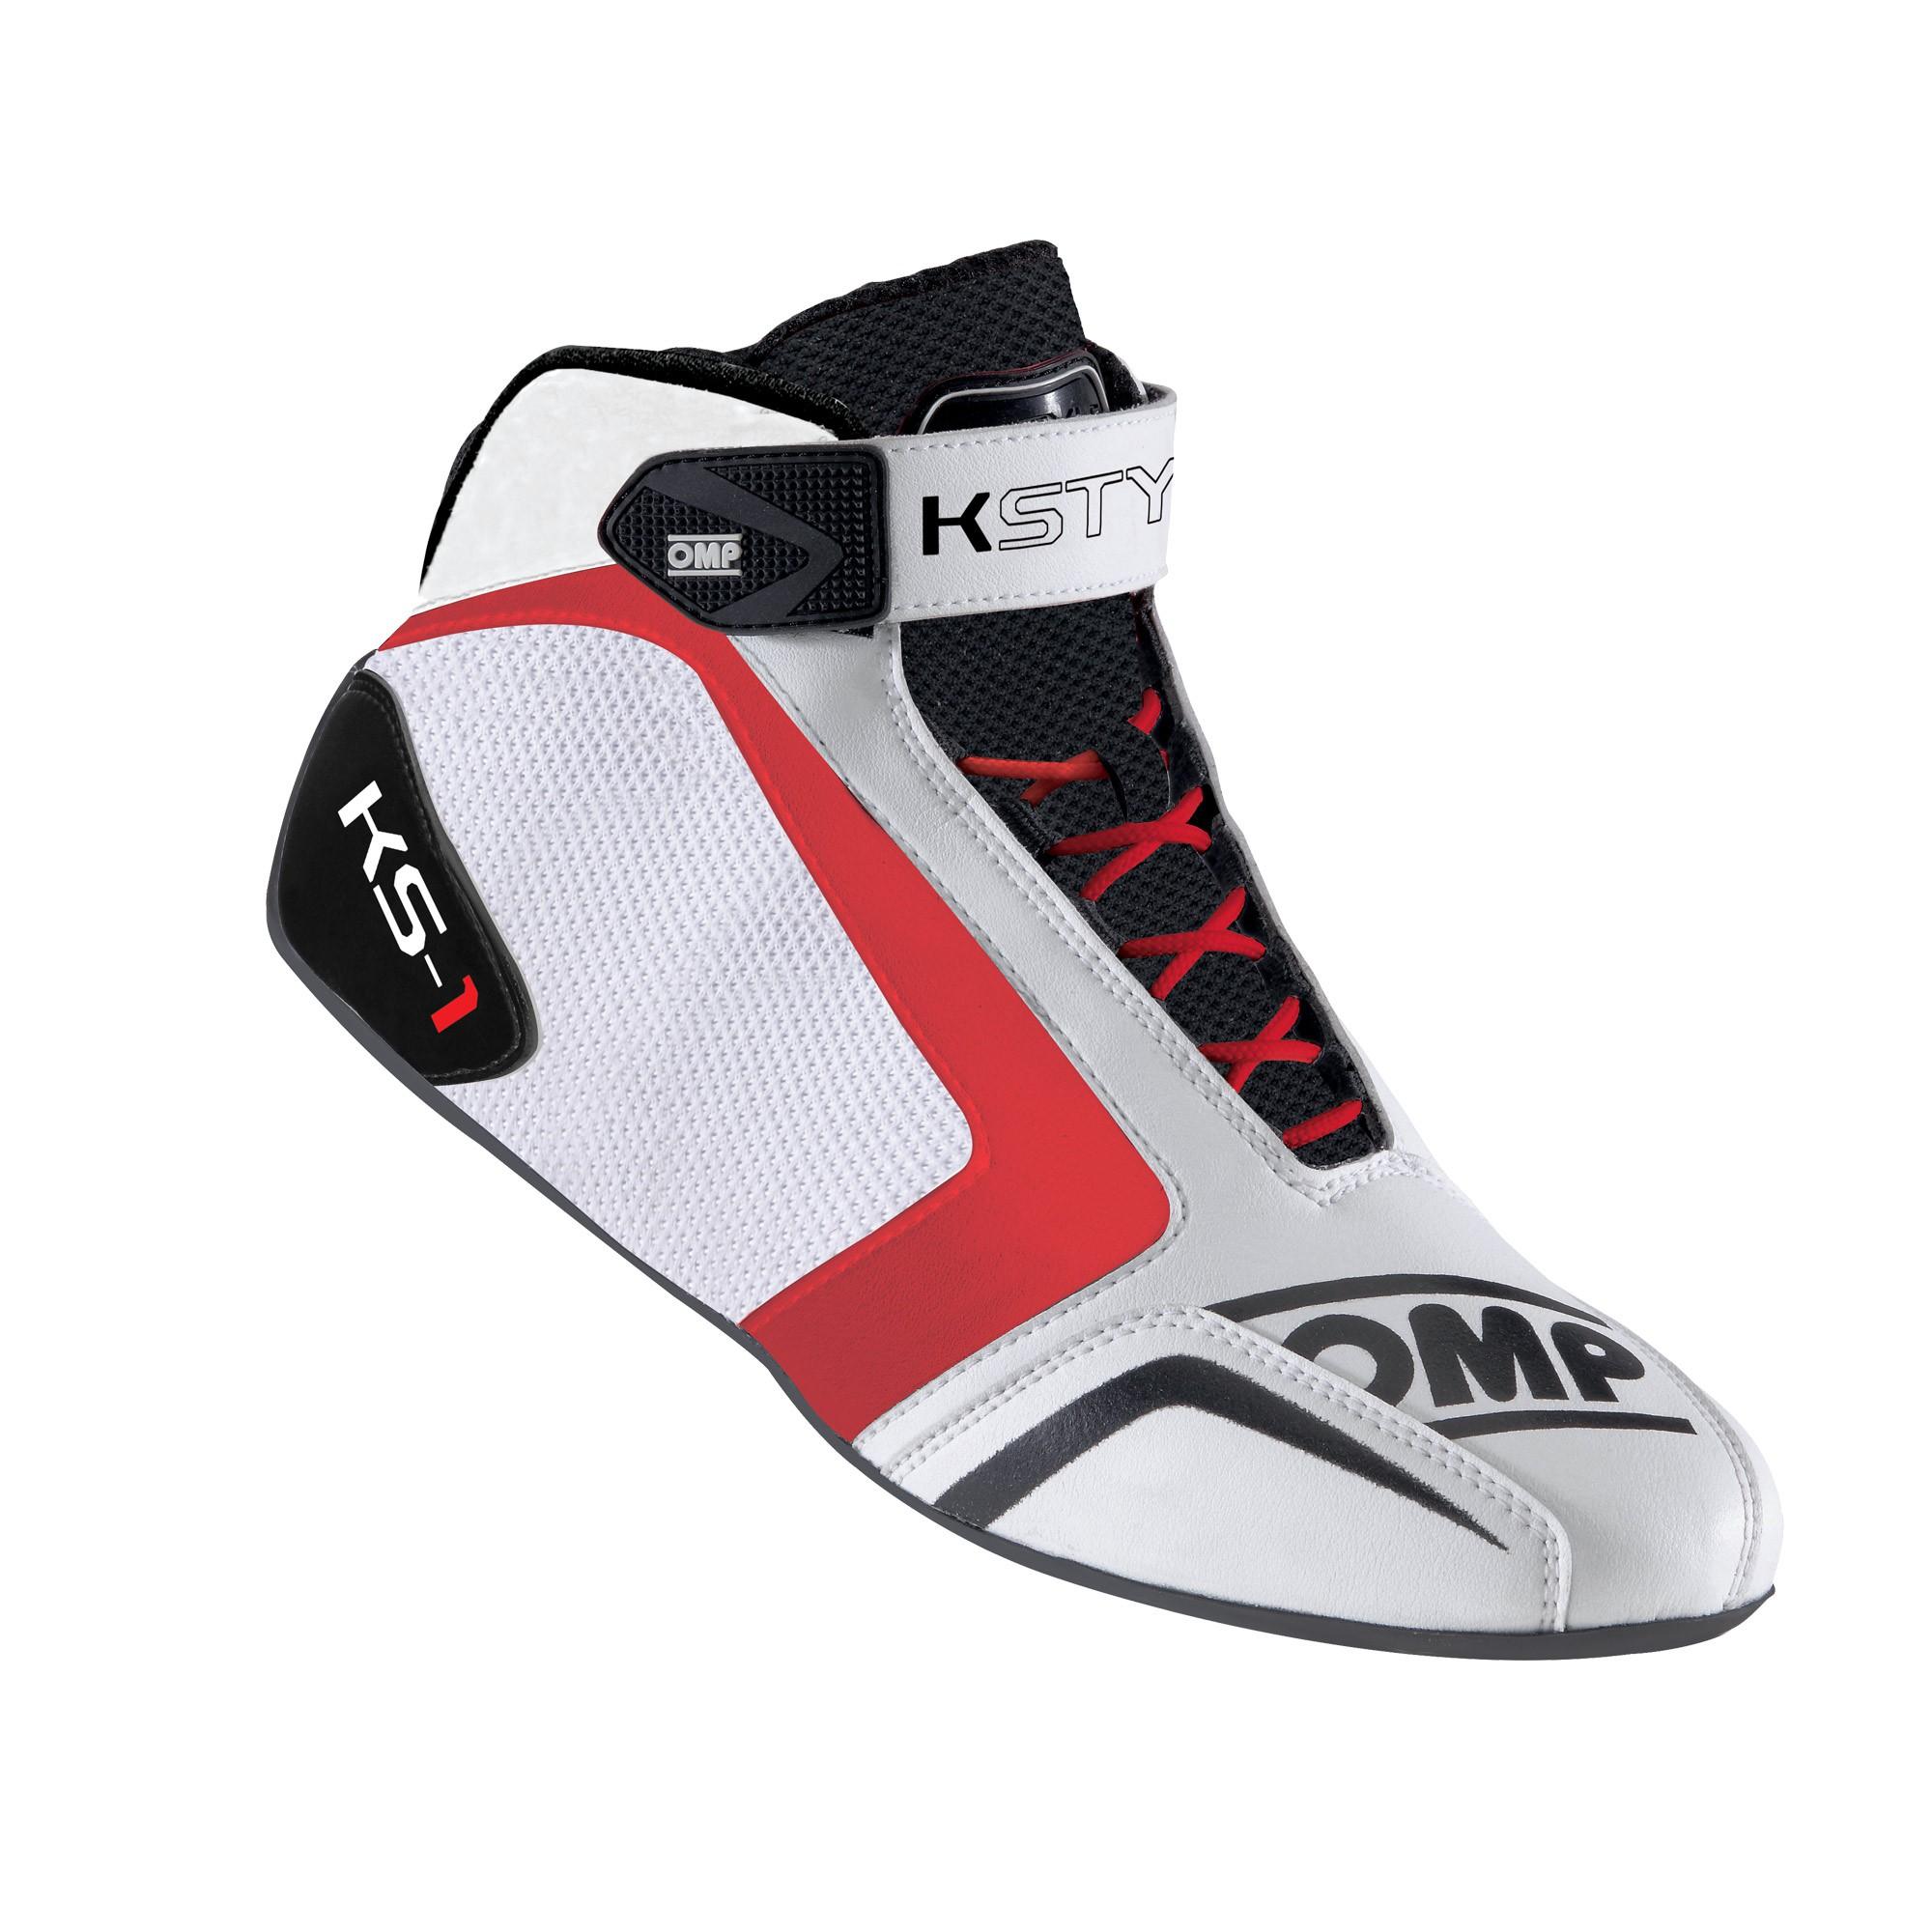 KS-1 SHOES WHITE/BLACK/RED SZ 32